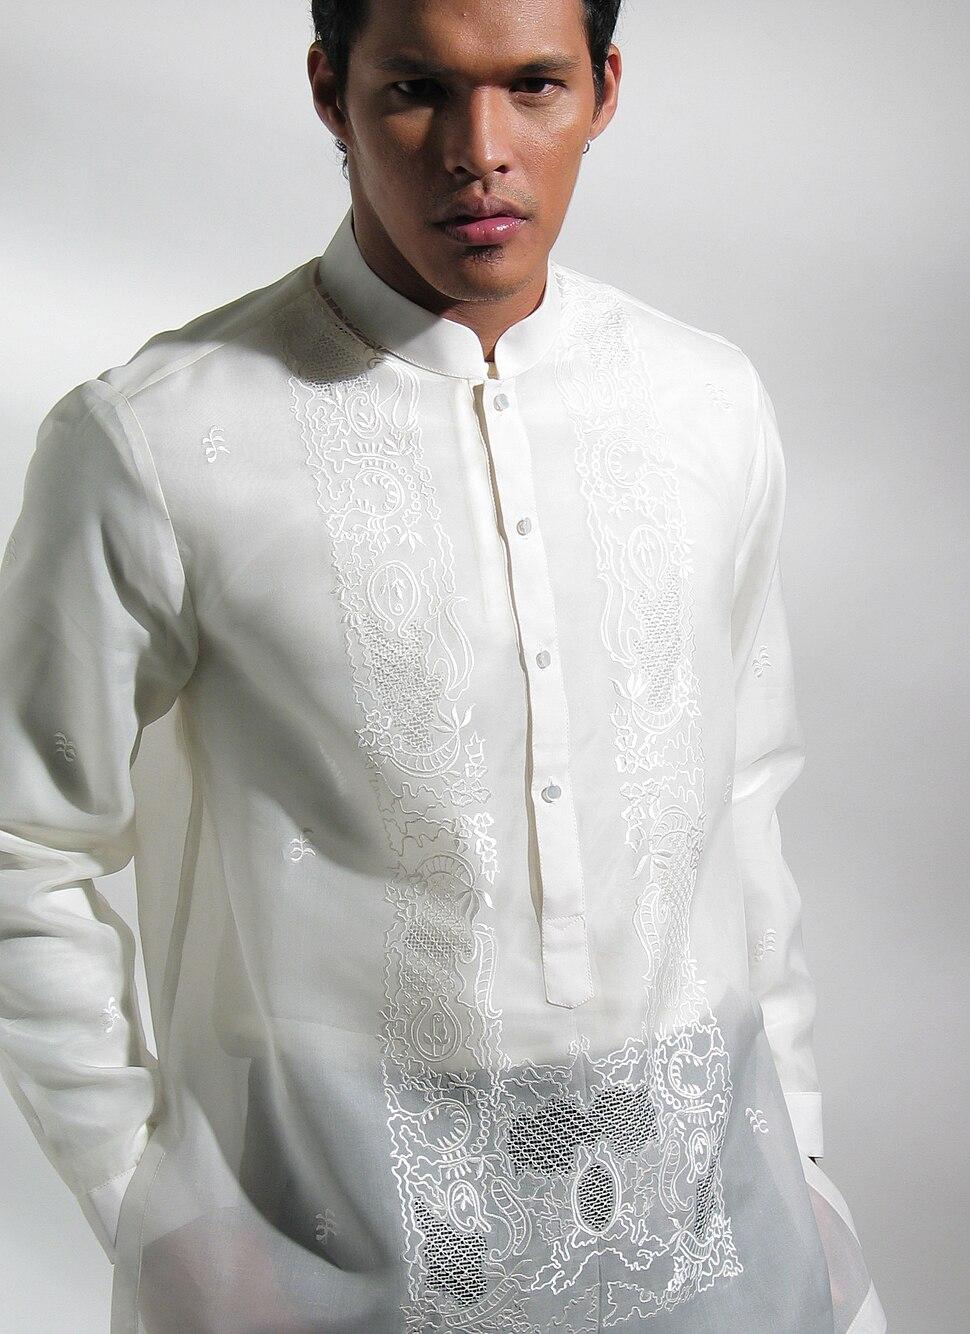 MyBarong created this Custom tailored Barong Tagalog for my wedding